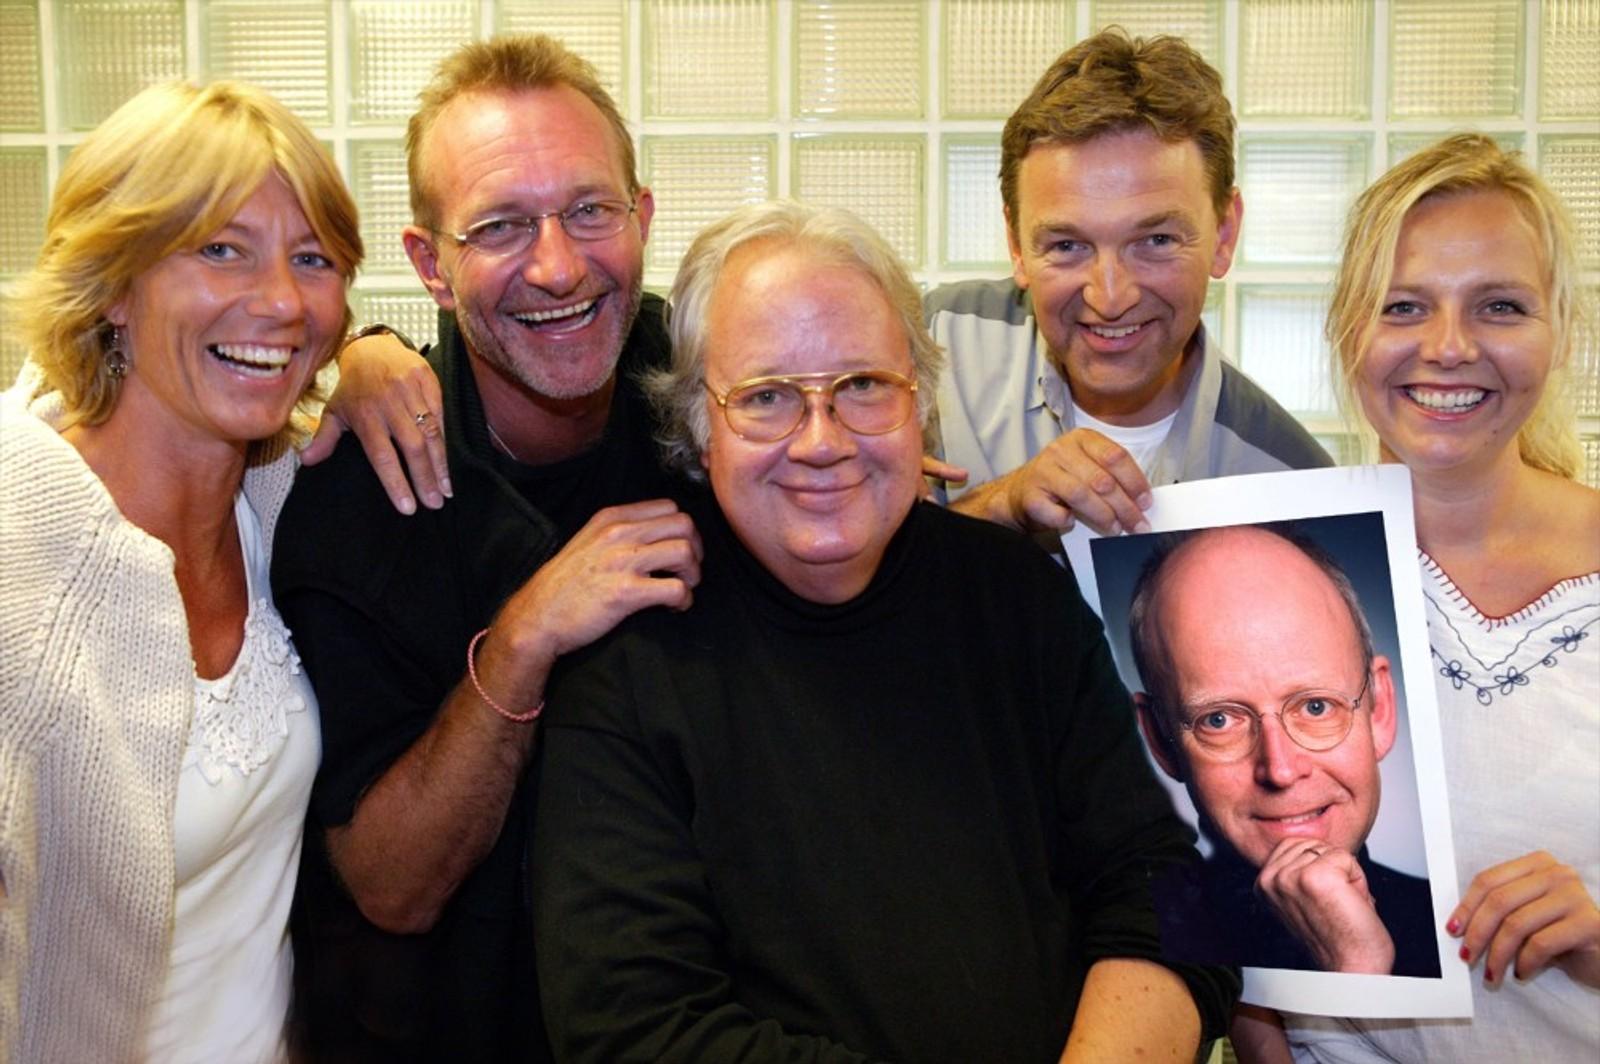 Cille Biermann, Nissa Nyberget, Knut Borge, Stig Holmer, Linn Skåber og en innfelt Trond Viggo Torgersen